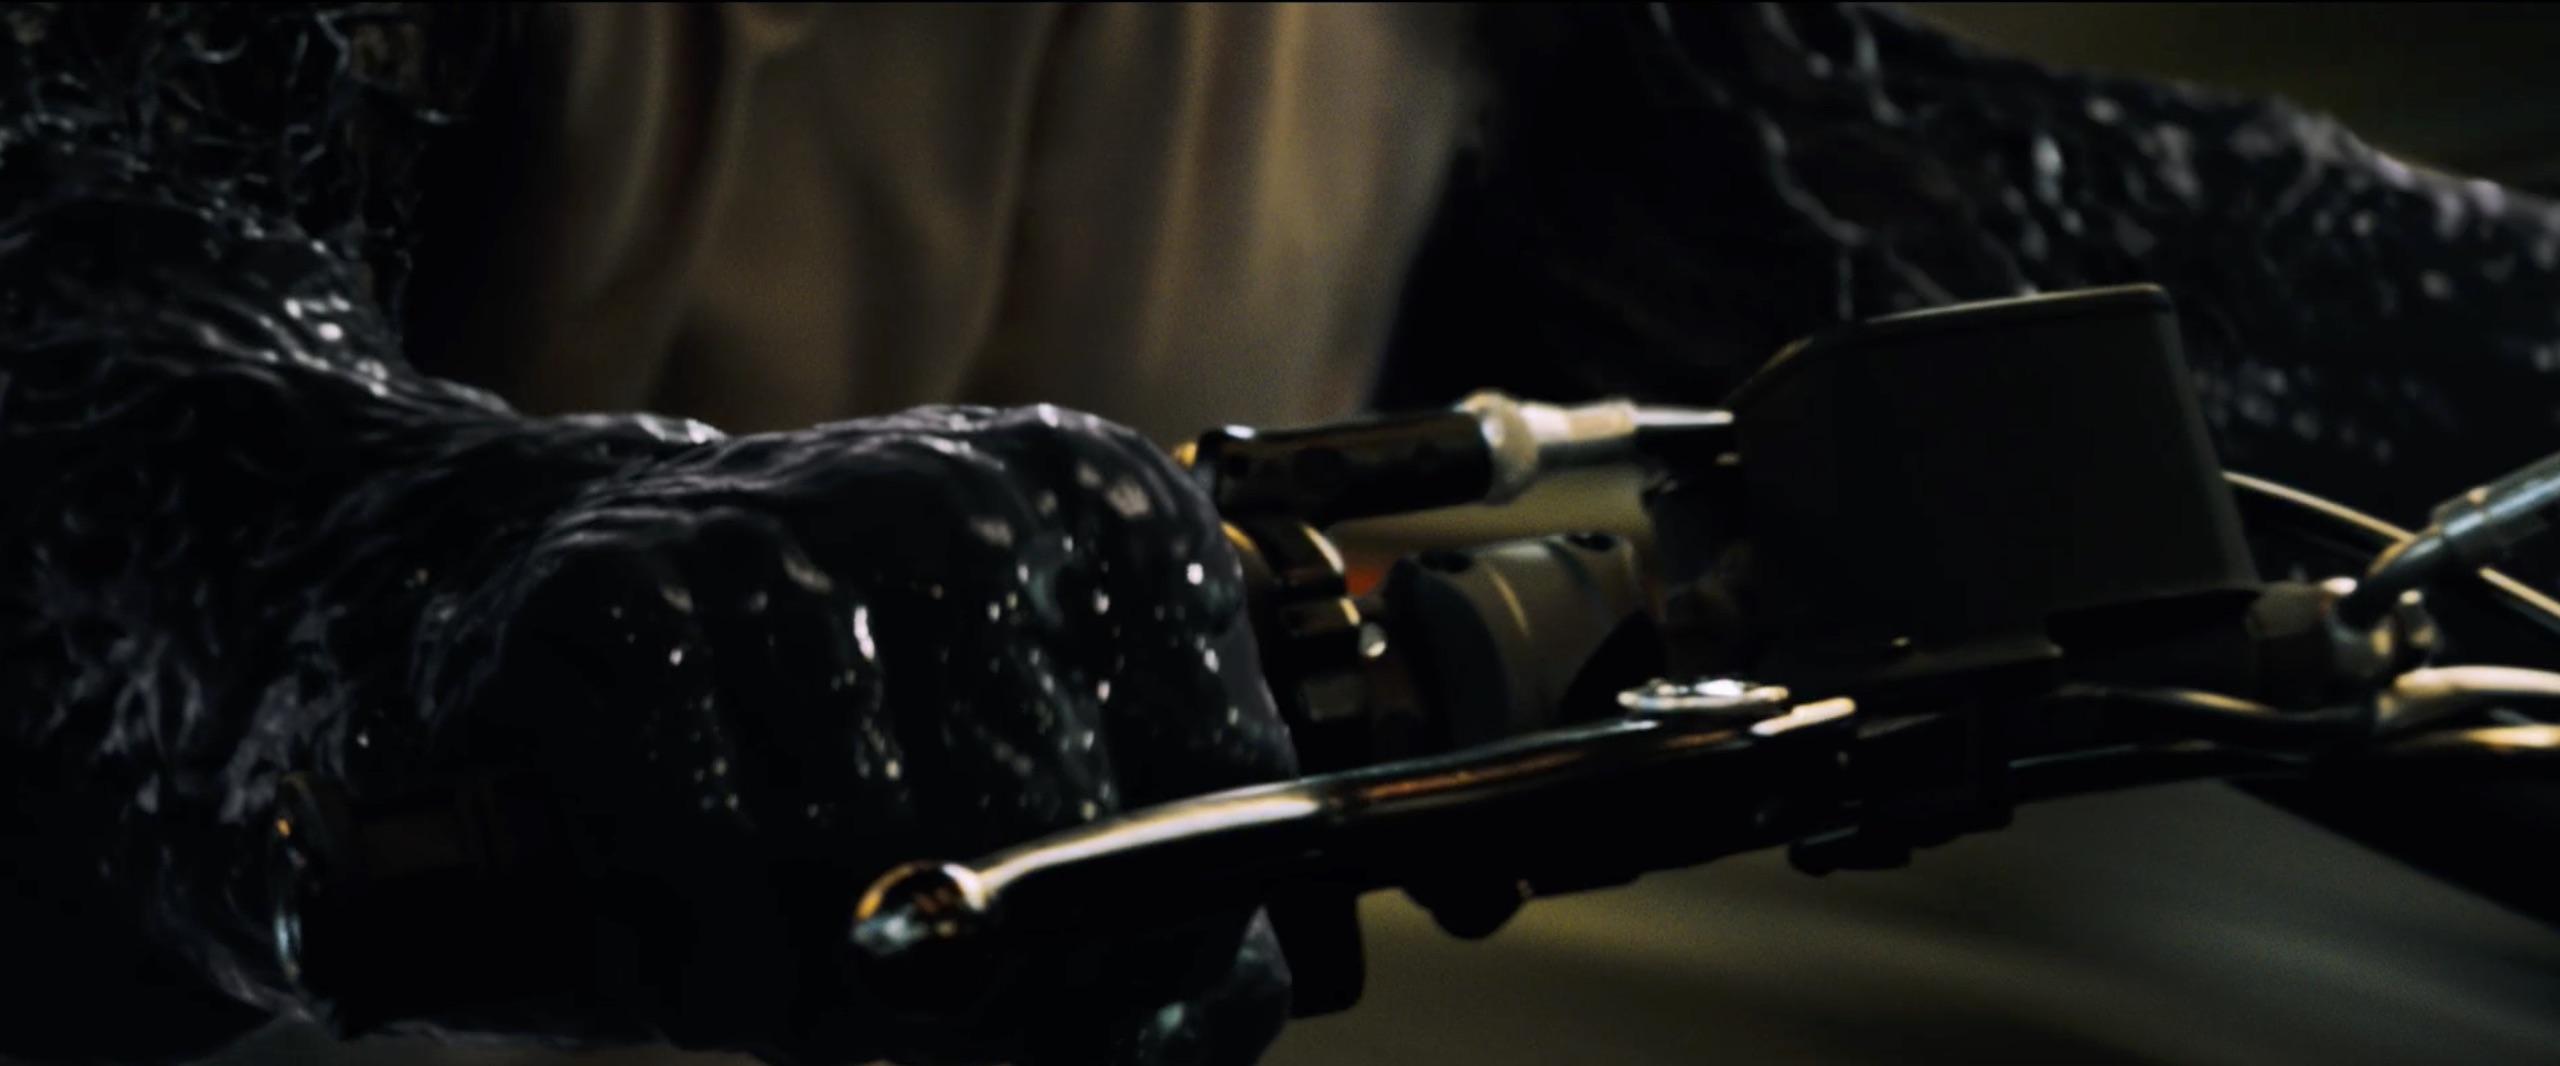 eddy brock venom covered motorcycle